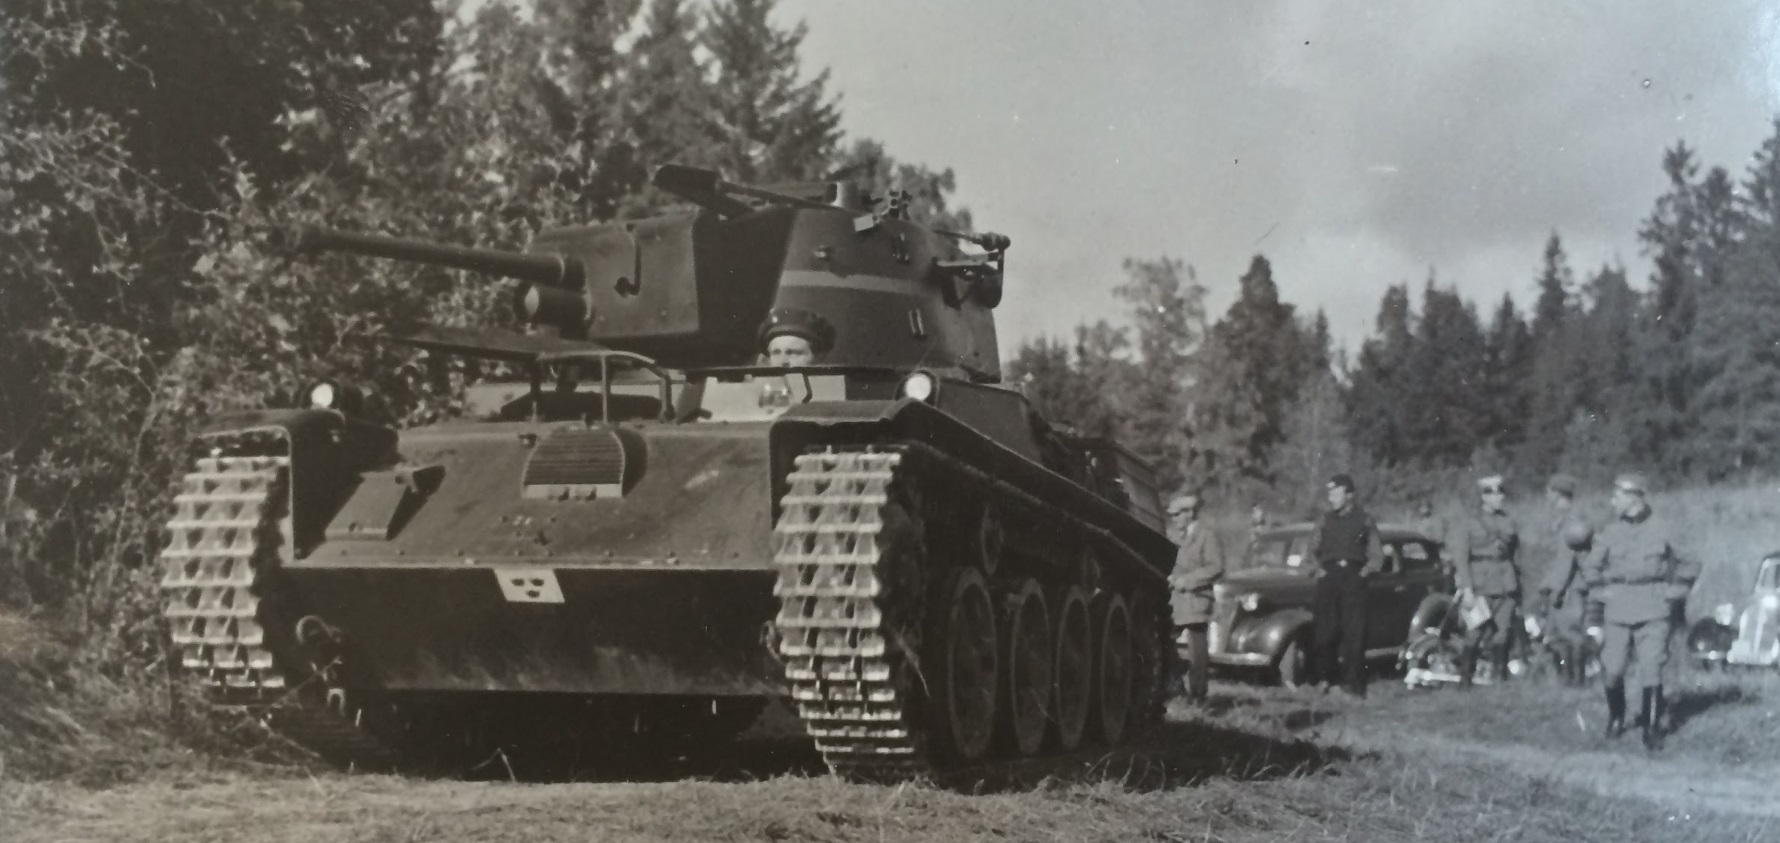 Strv_m38_history.jpg